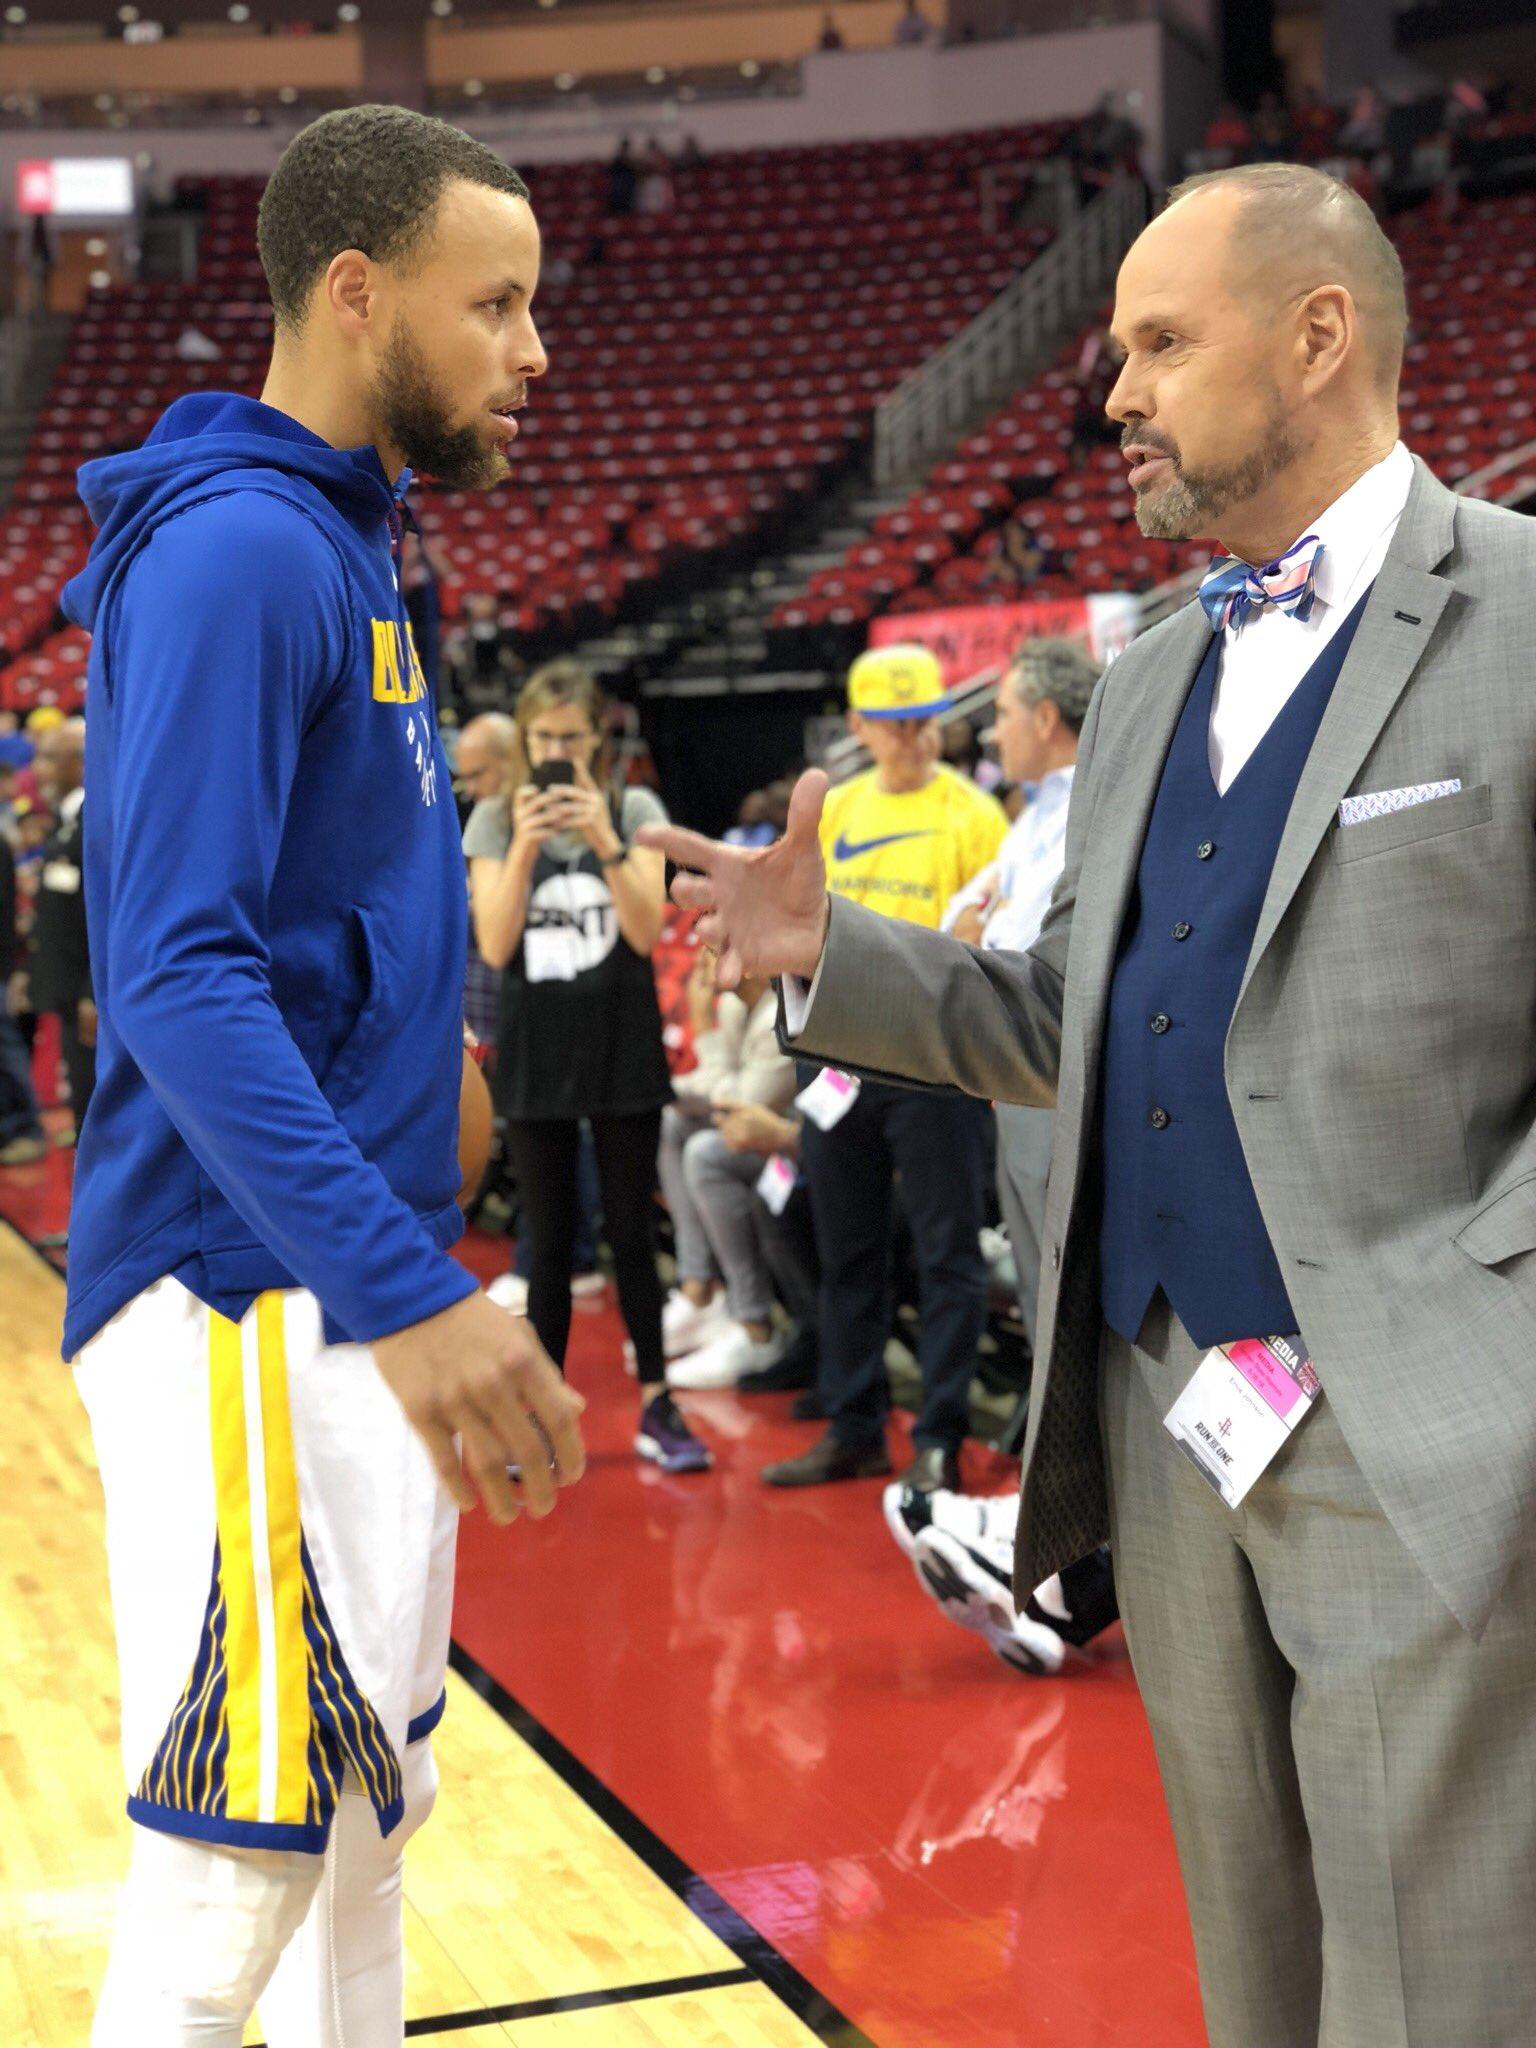 Steph x EJ. #NBAPlayoffs https://t.co/cbgTYBQCZs